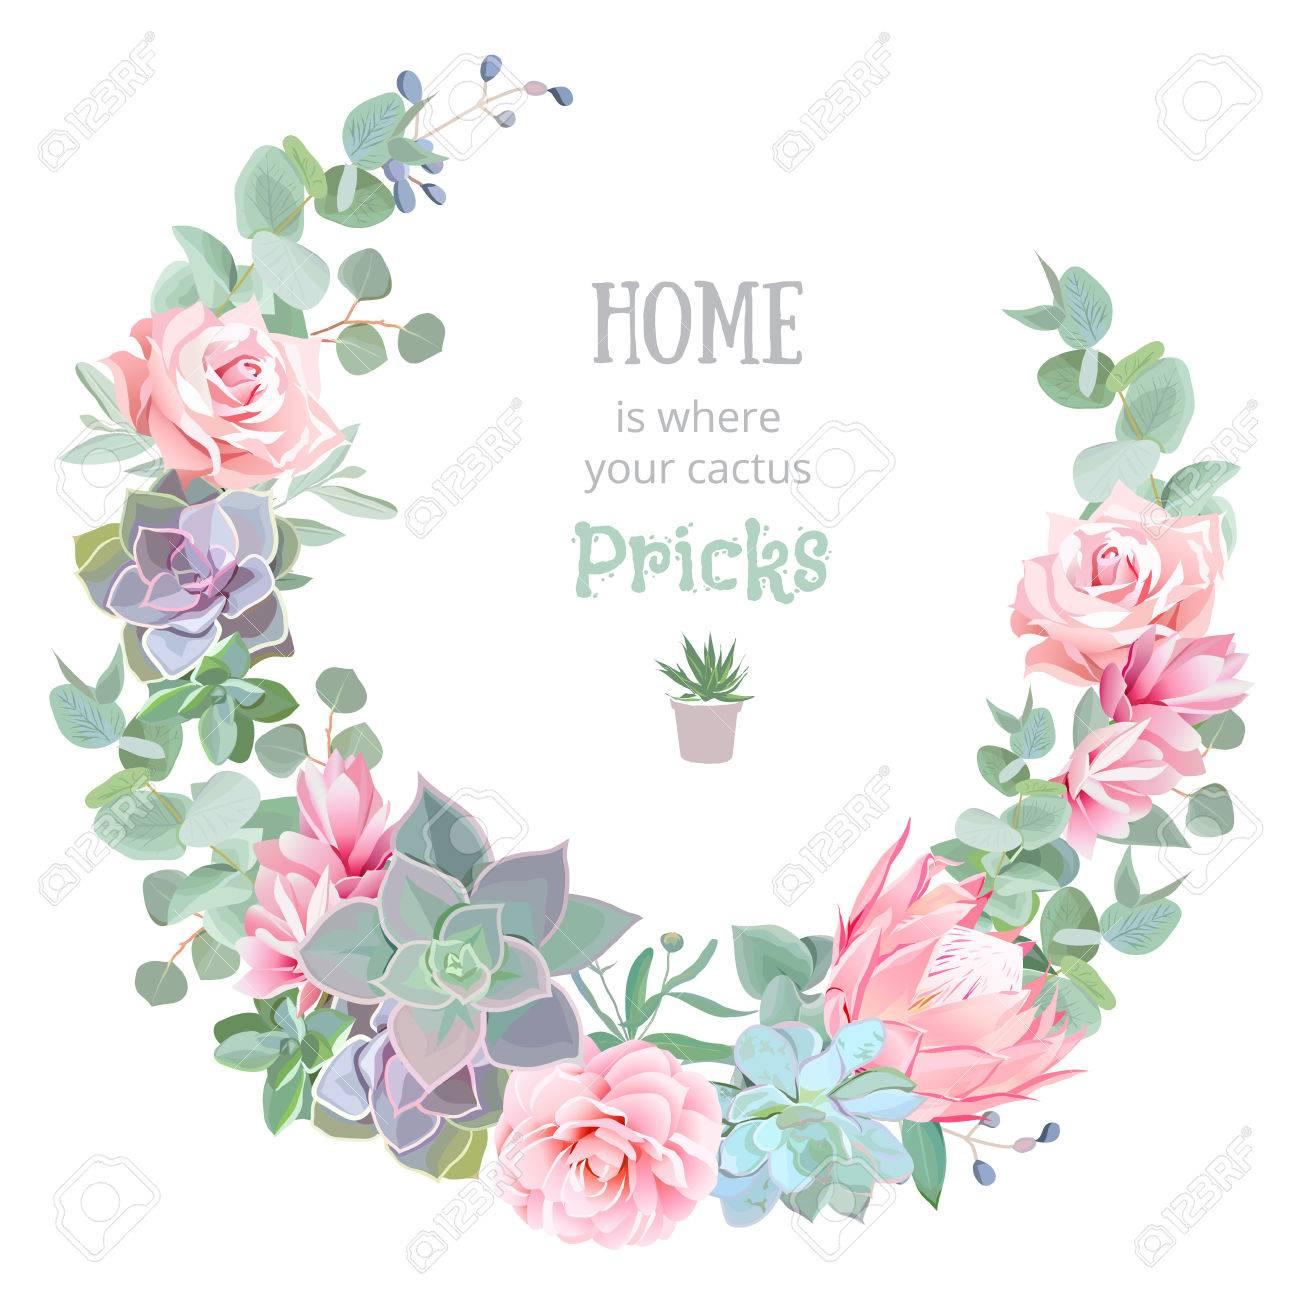 Stylish floral design round frame. Rose, camellia, pink flowers, echeveria, protea, eucaliptus leaves. - 62690883